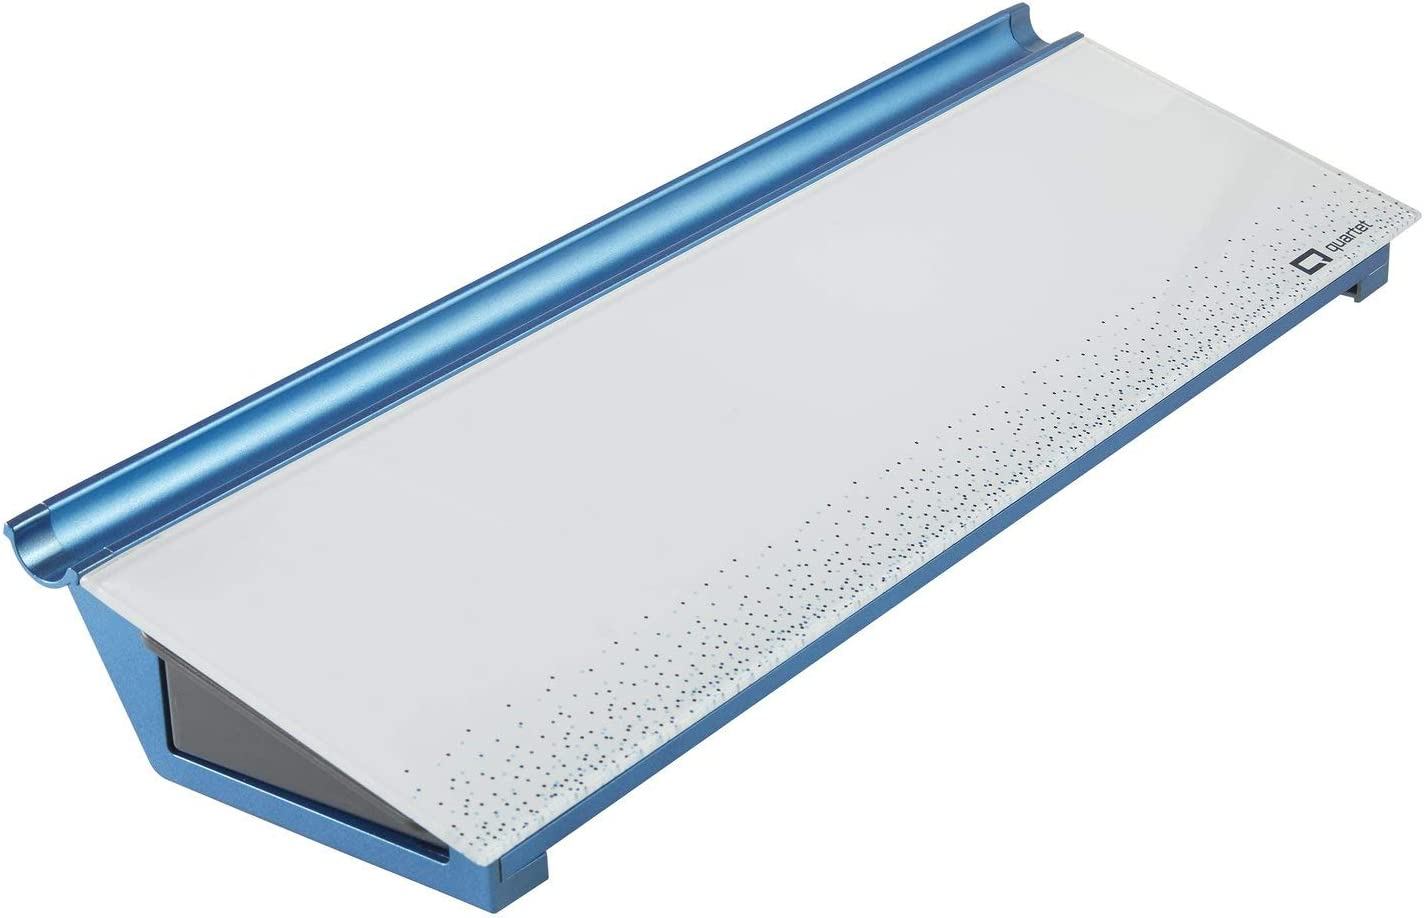 "Quartet Glass Desktop Computer Pad, 18"" x 6"", Whiteboard, Dry Erase Surface, Dot (GDP186D)"